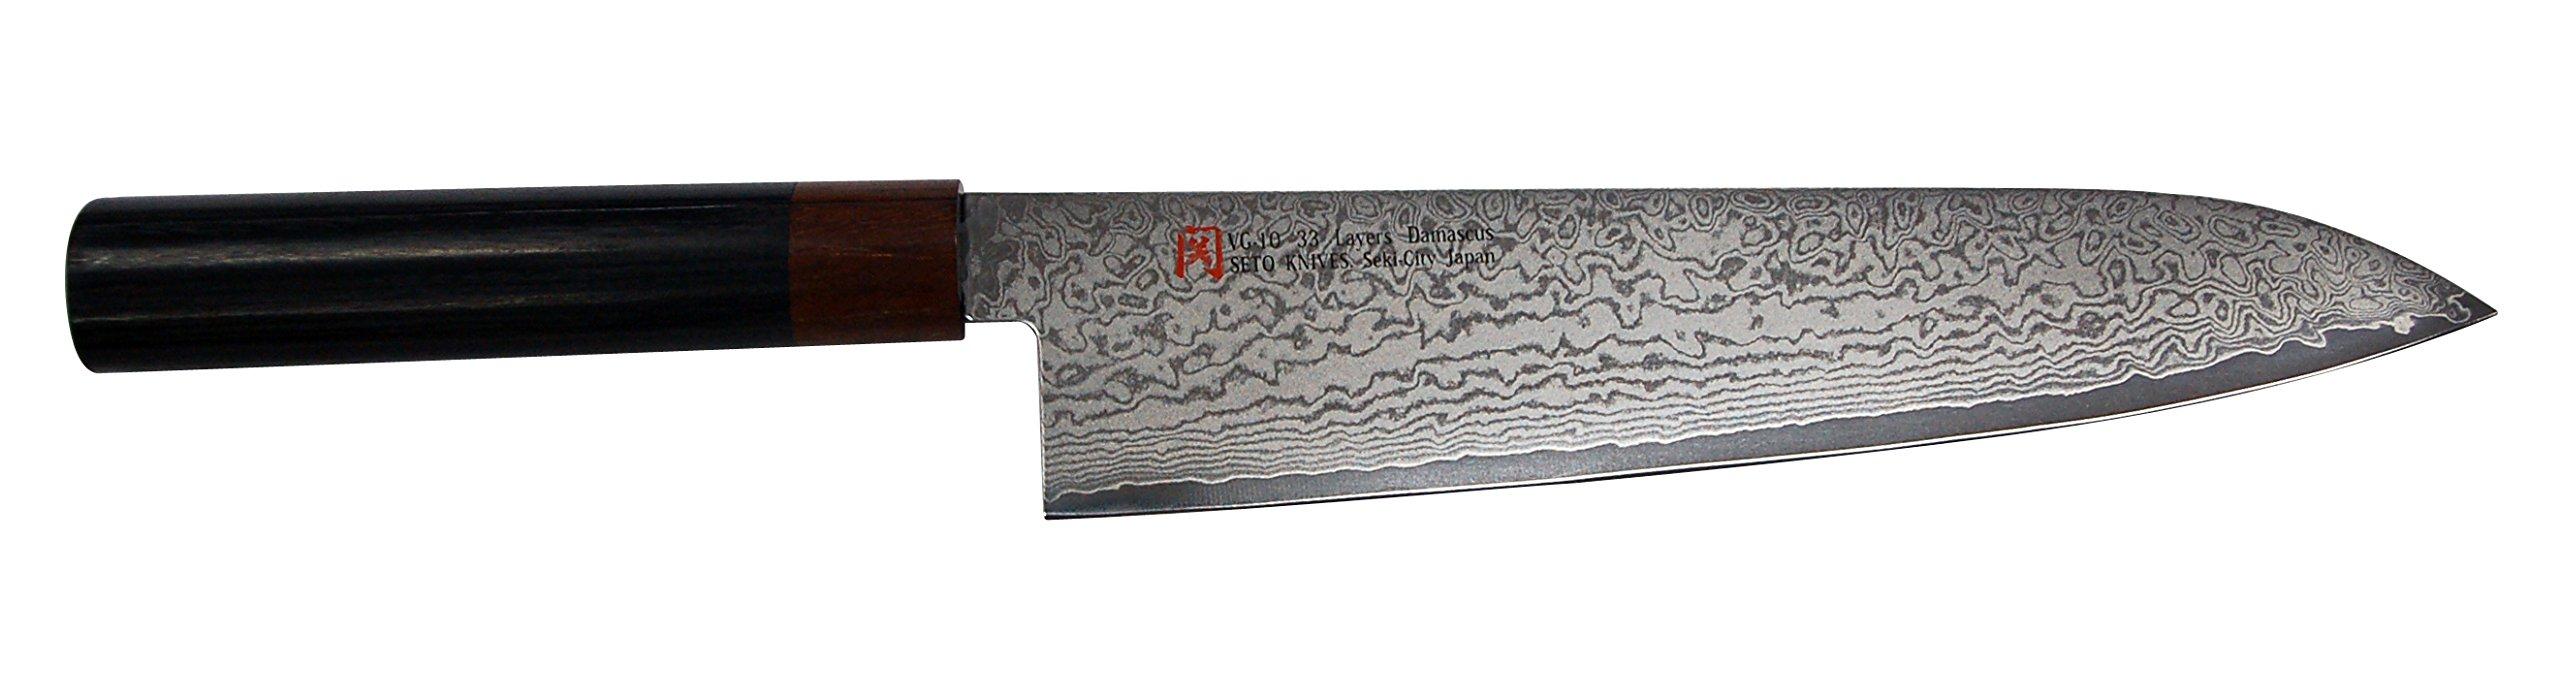 SETO Japanese Chef Knives: Damascus Forged Steel from World Famous Seki, Japan (I-4 Pro: 210m/ m: GYUTO KNIFE)